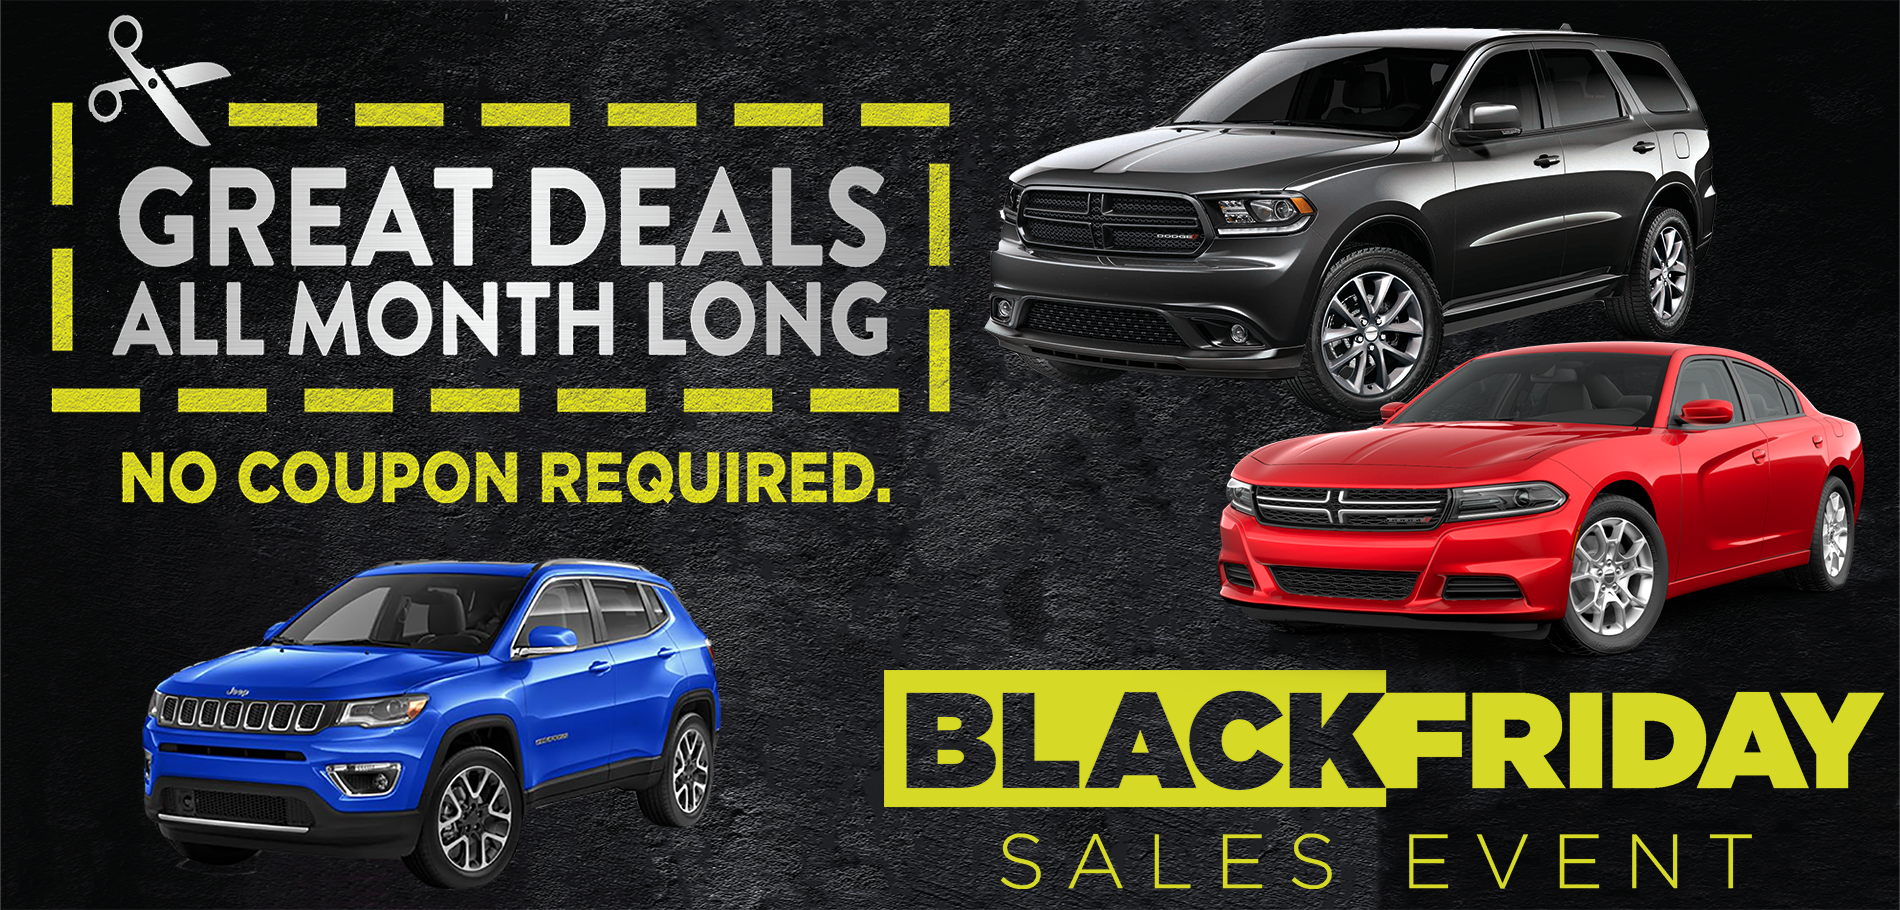 Black Friday Sales Event 2017